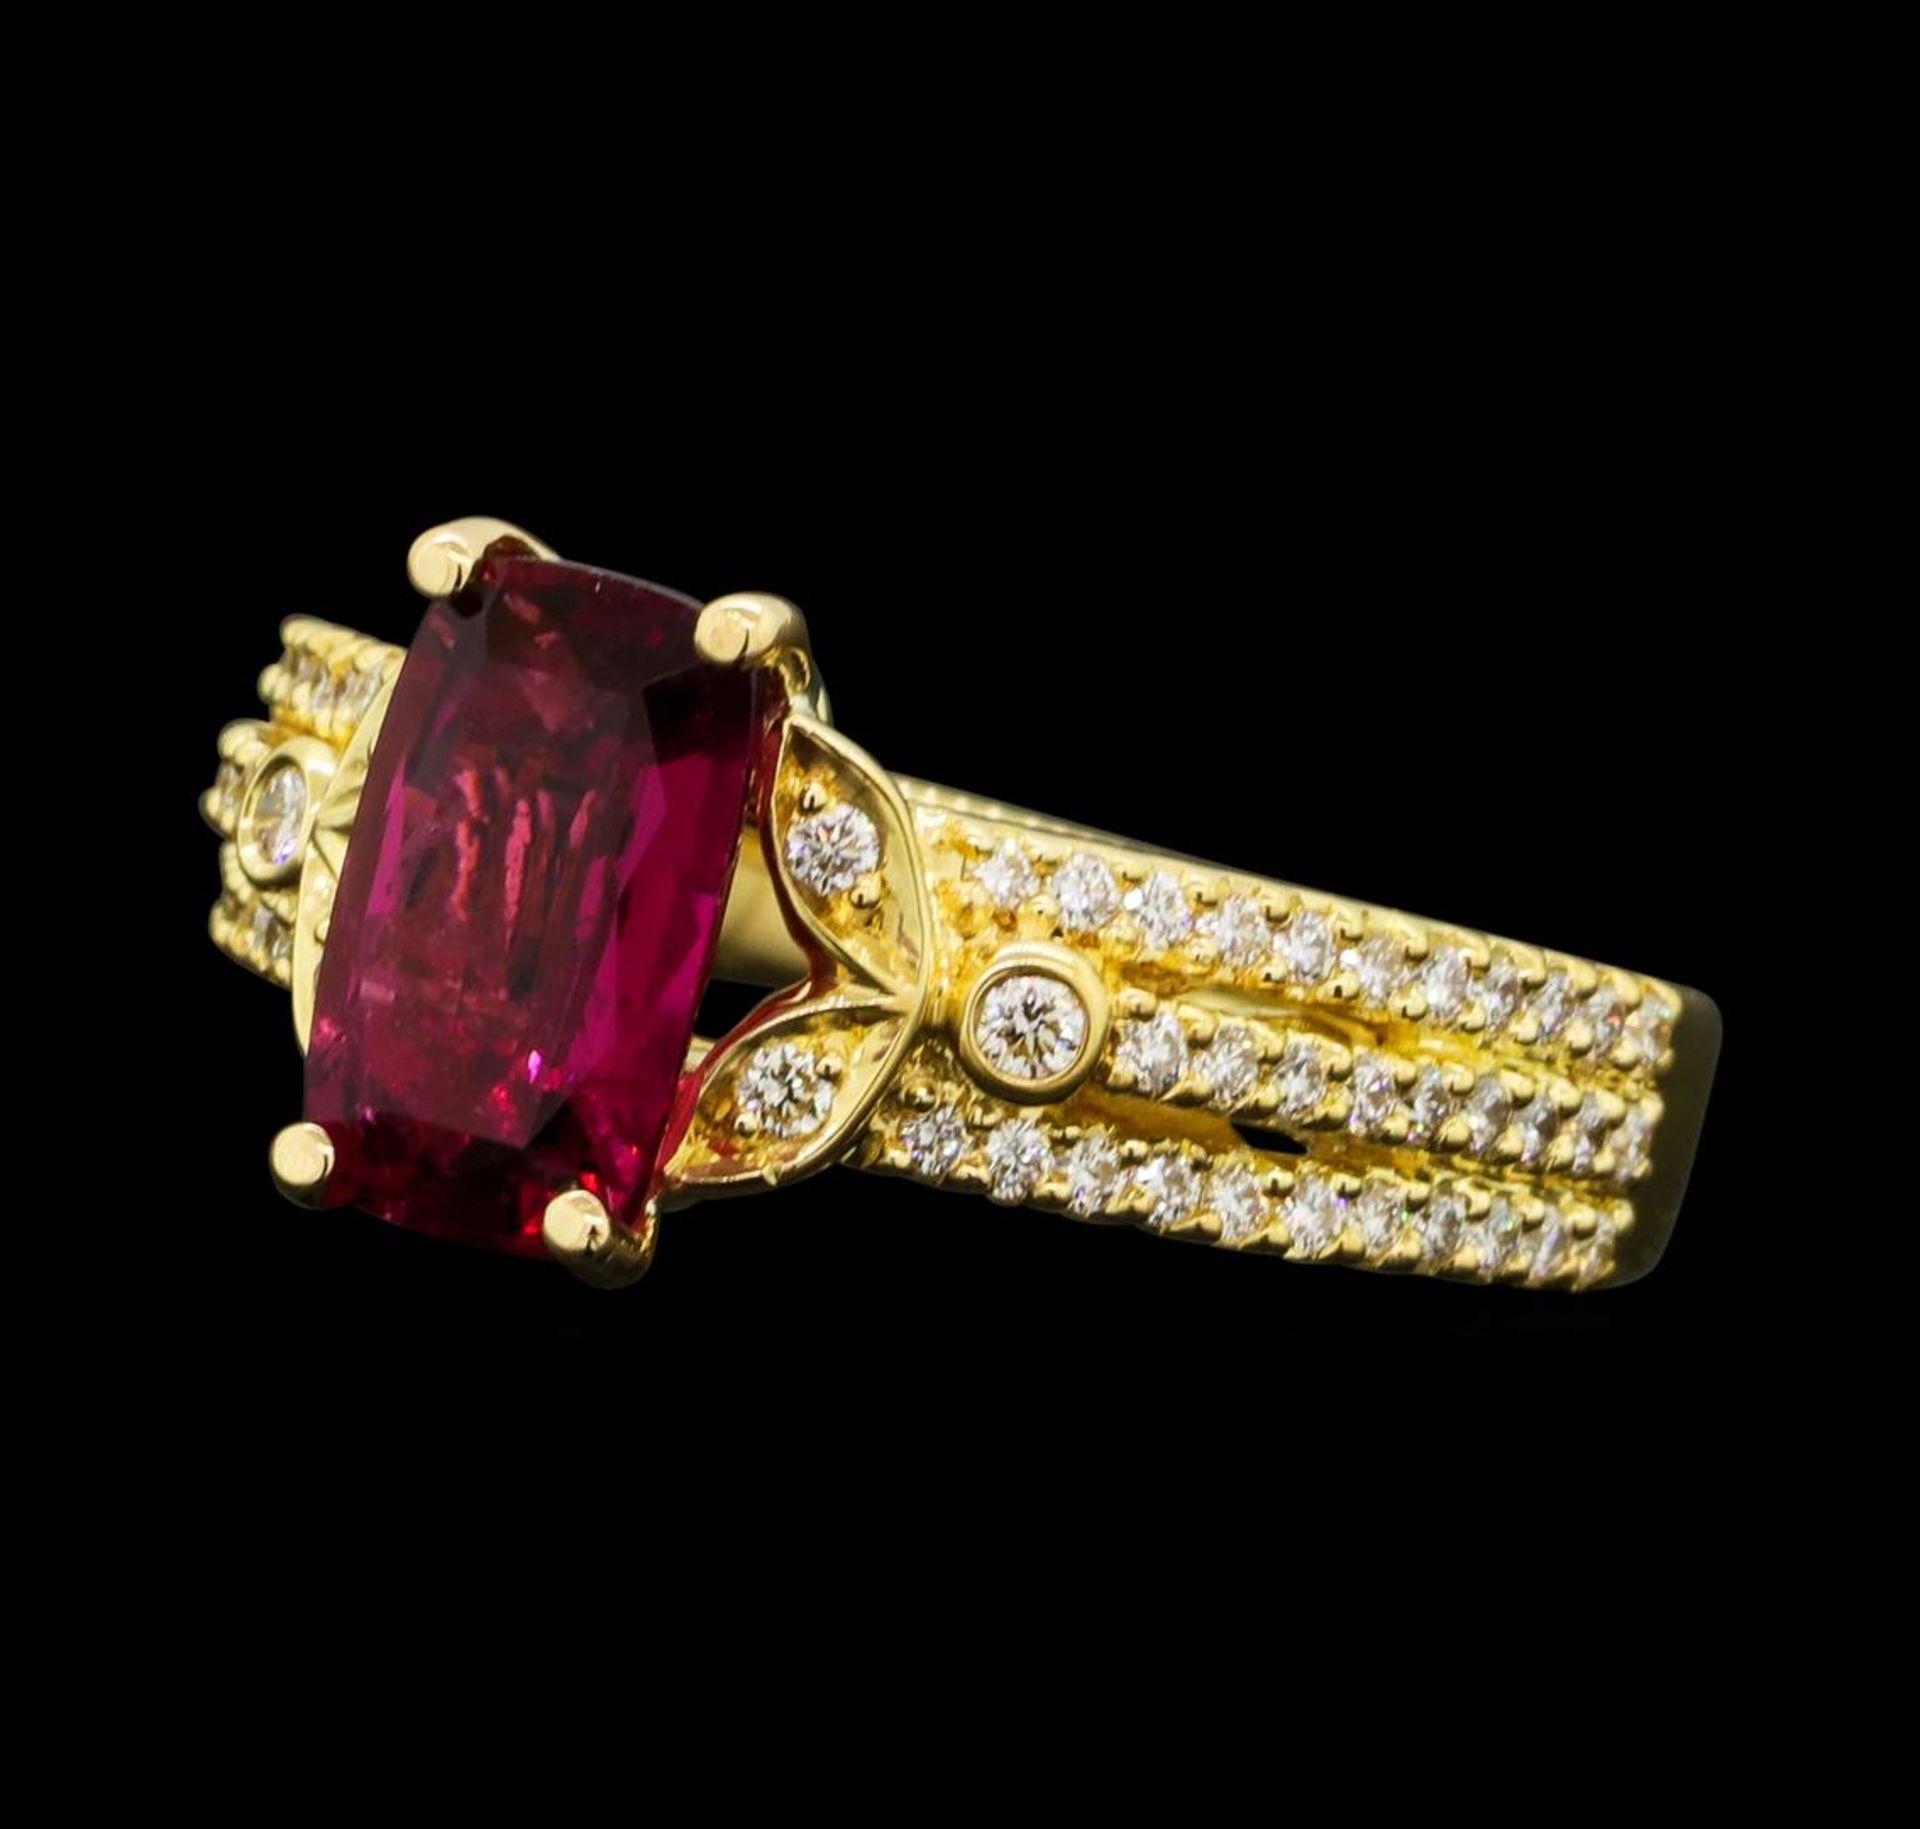 1.50 ct Pink Tourmaling And Diamond Ring - 18KT Yellow Gold